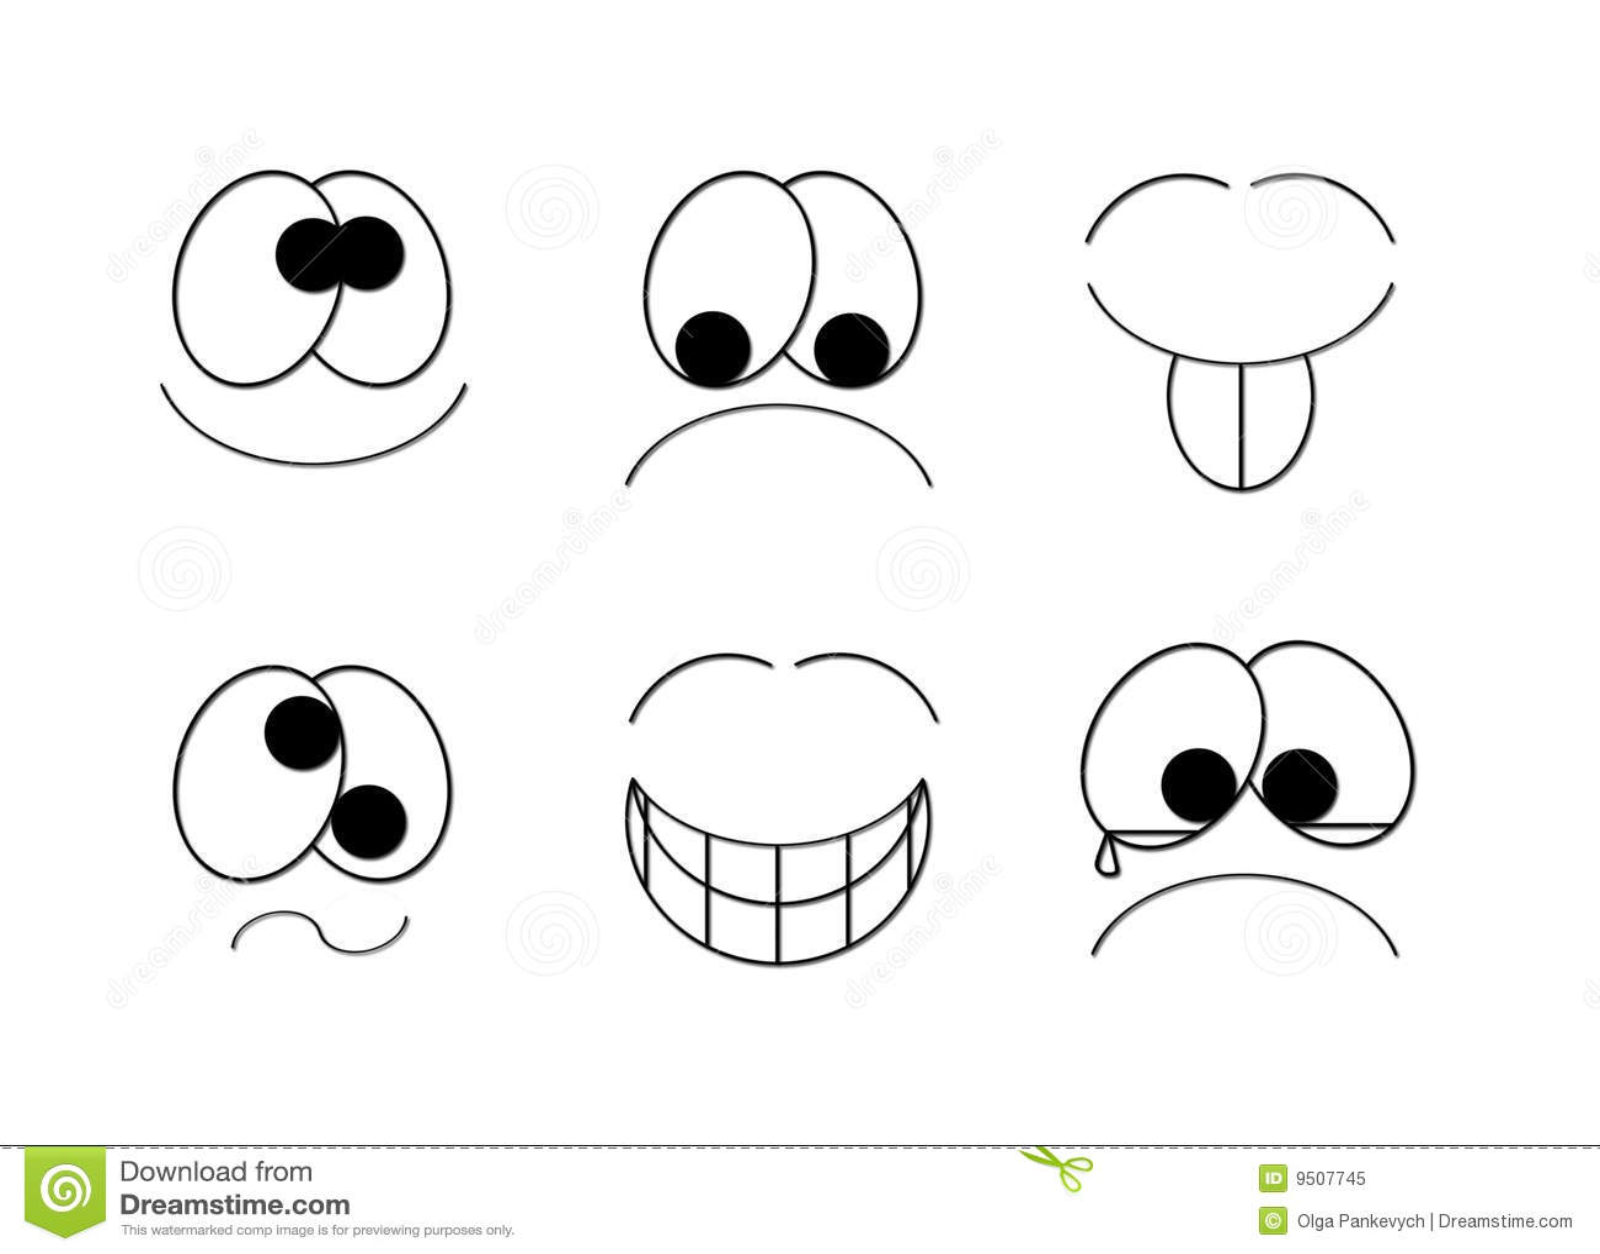 Simple Smiles Royalty Free Stock Photo